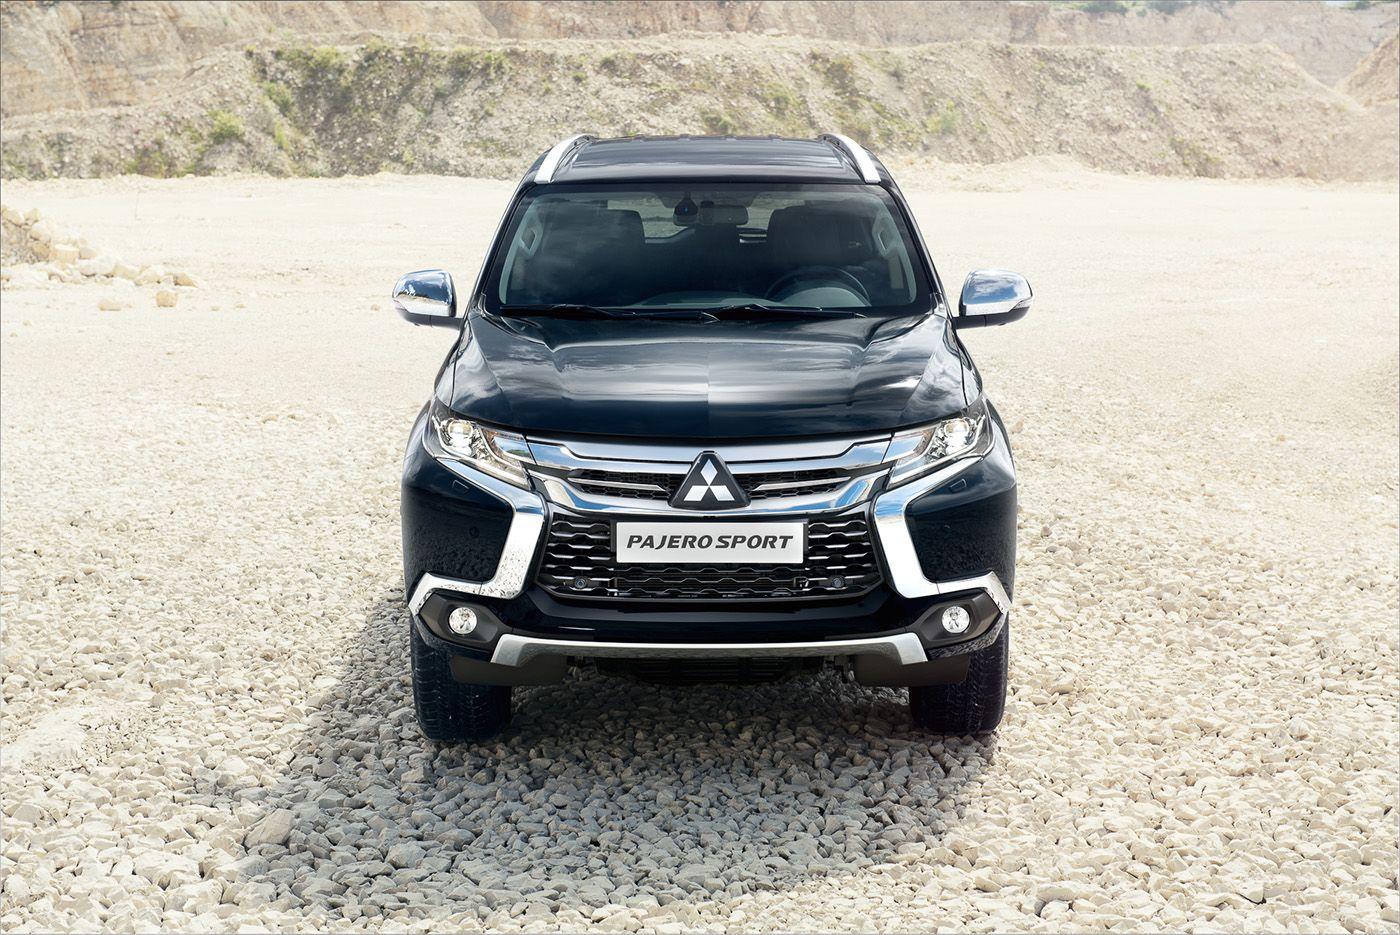 New Mitsubishi Pajero Sport Campaign On Behance Mobil Kendaraan